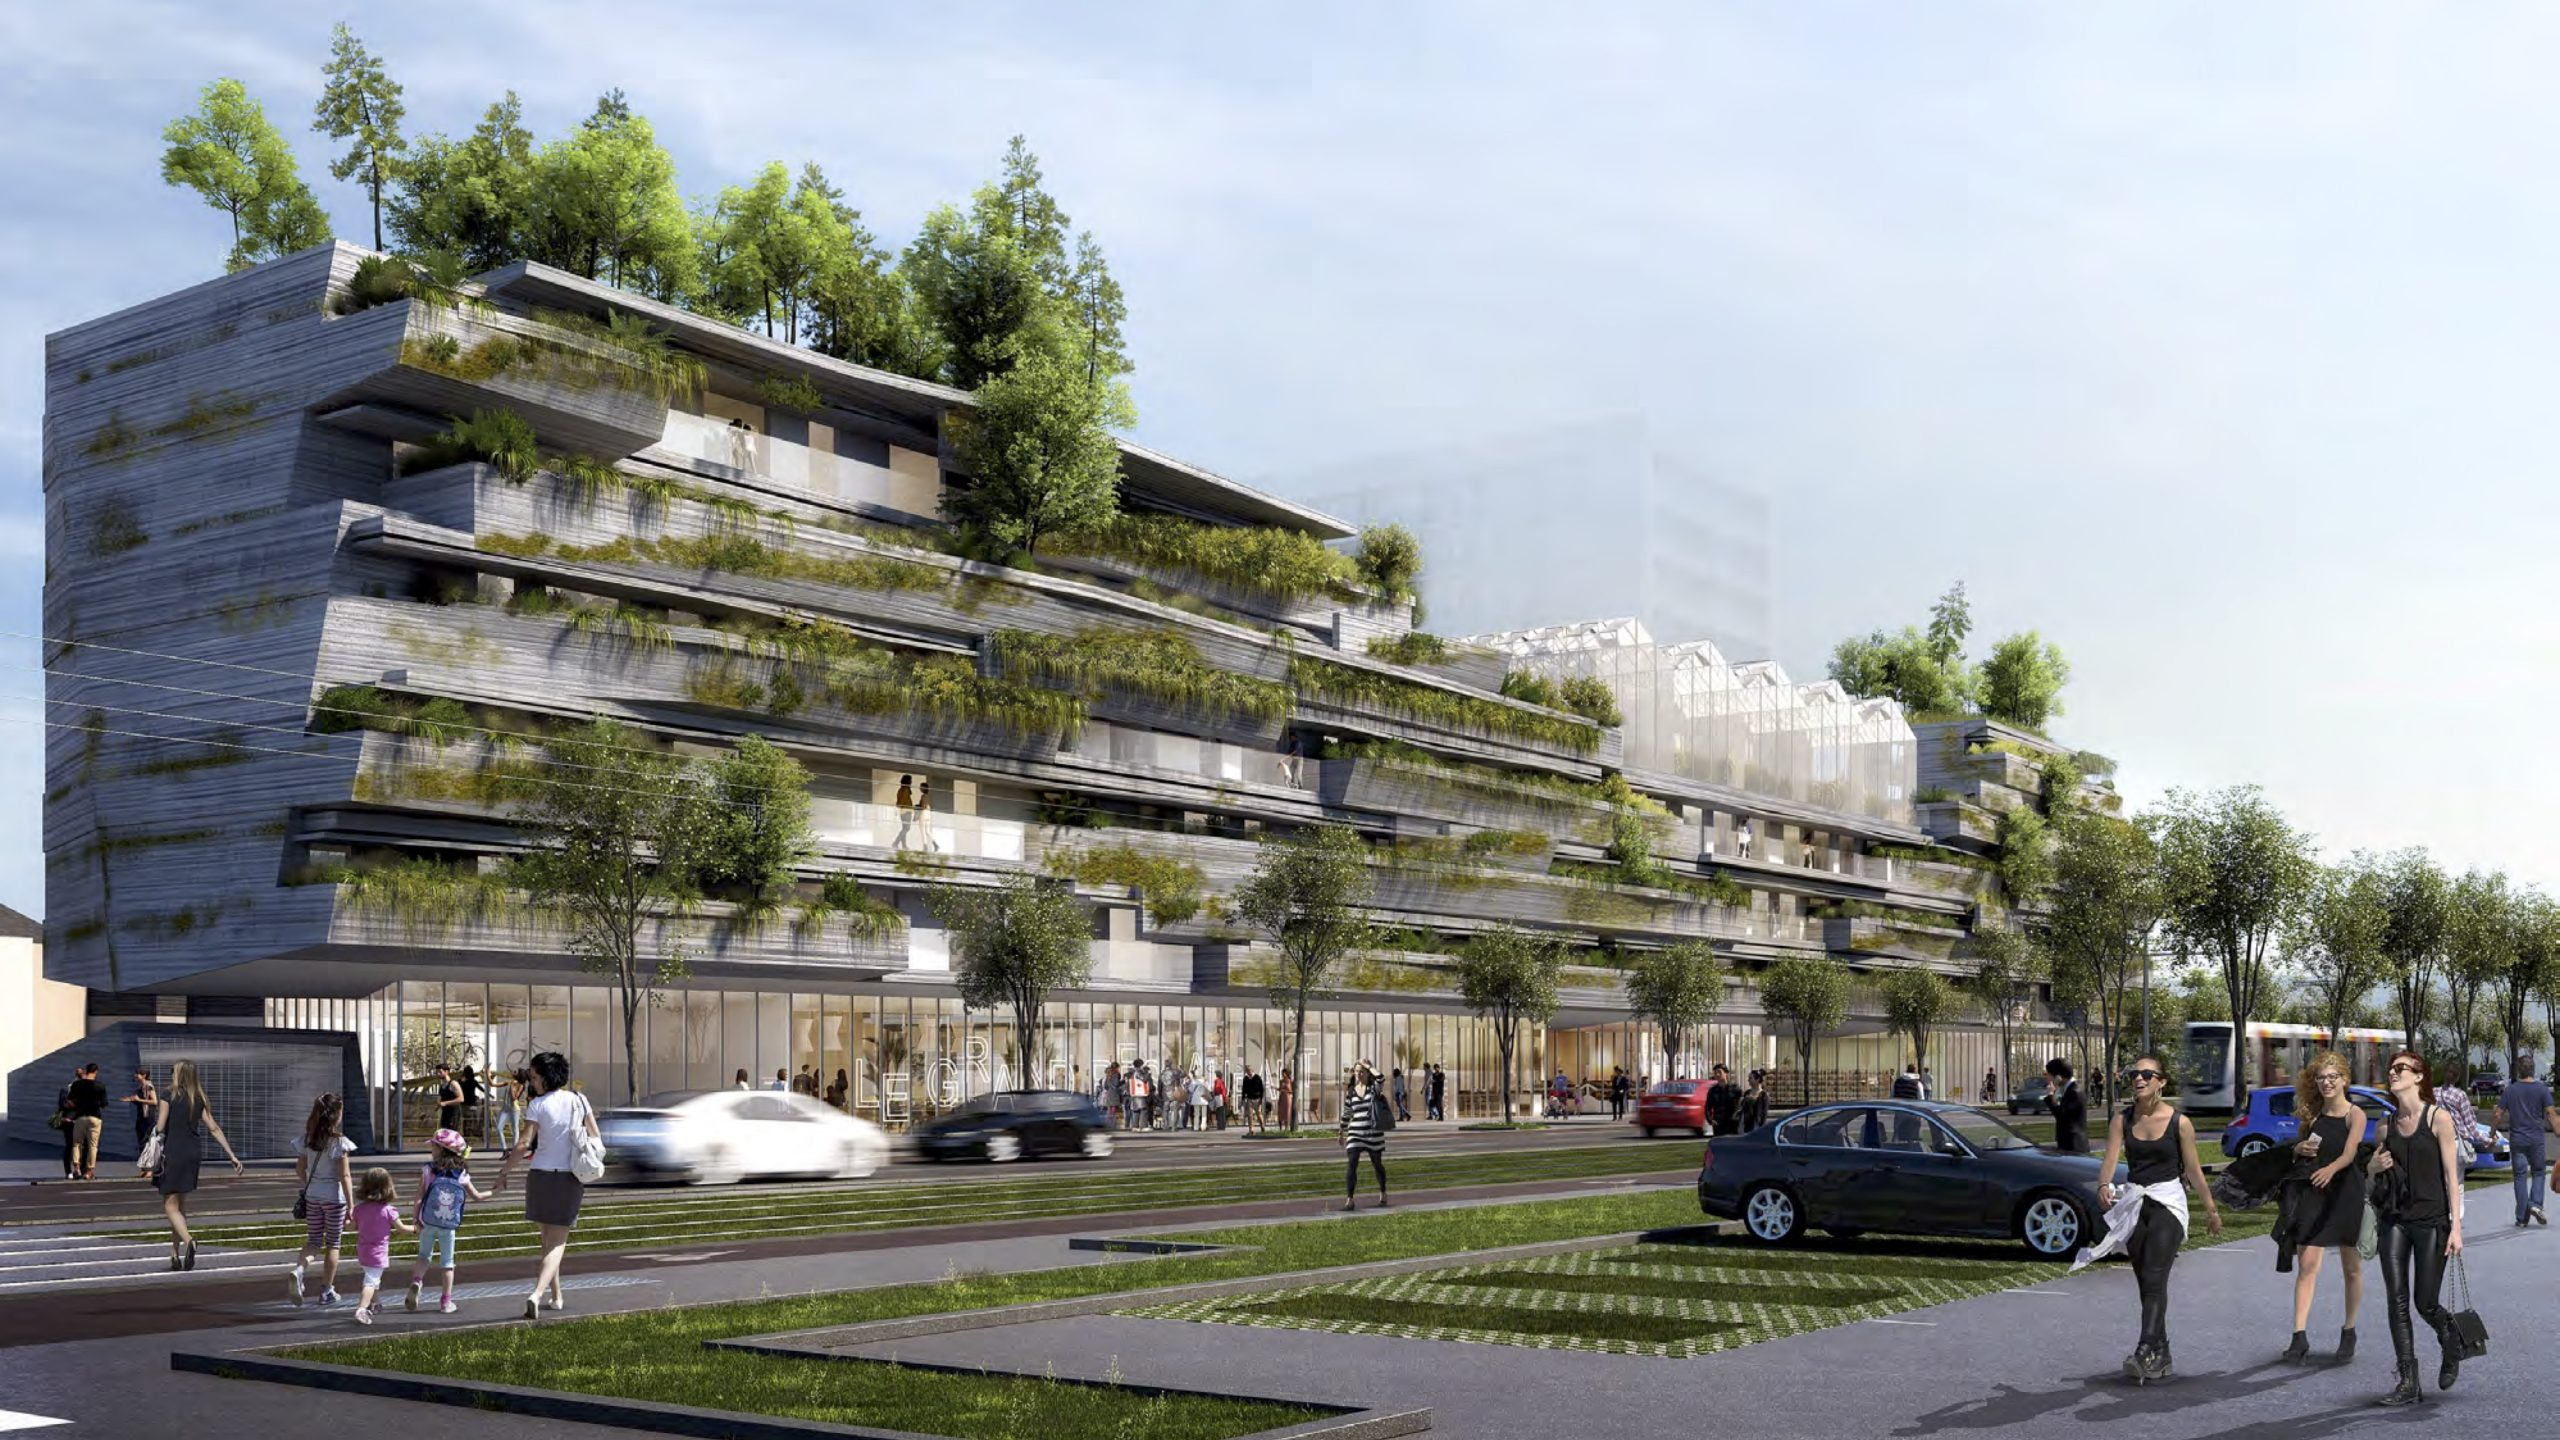 WE AGRI - Ferme urbaine Climax Angers